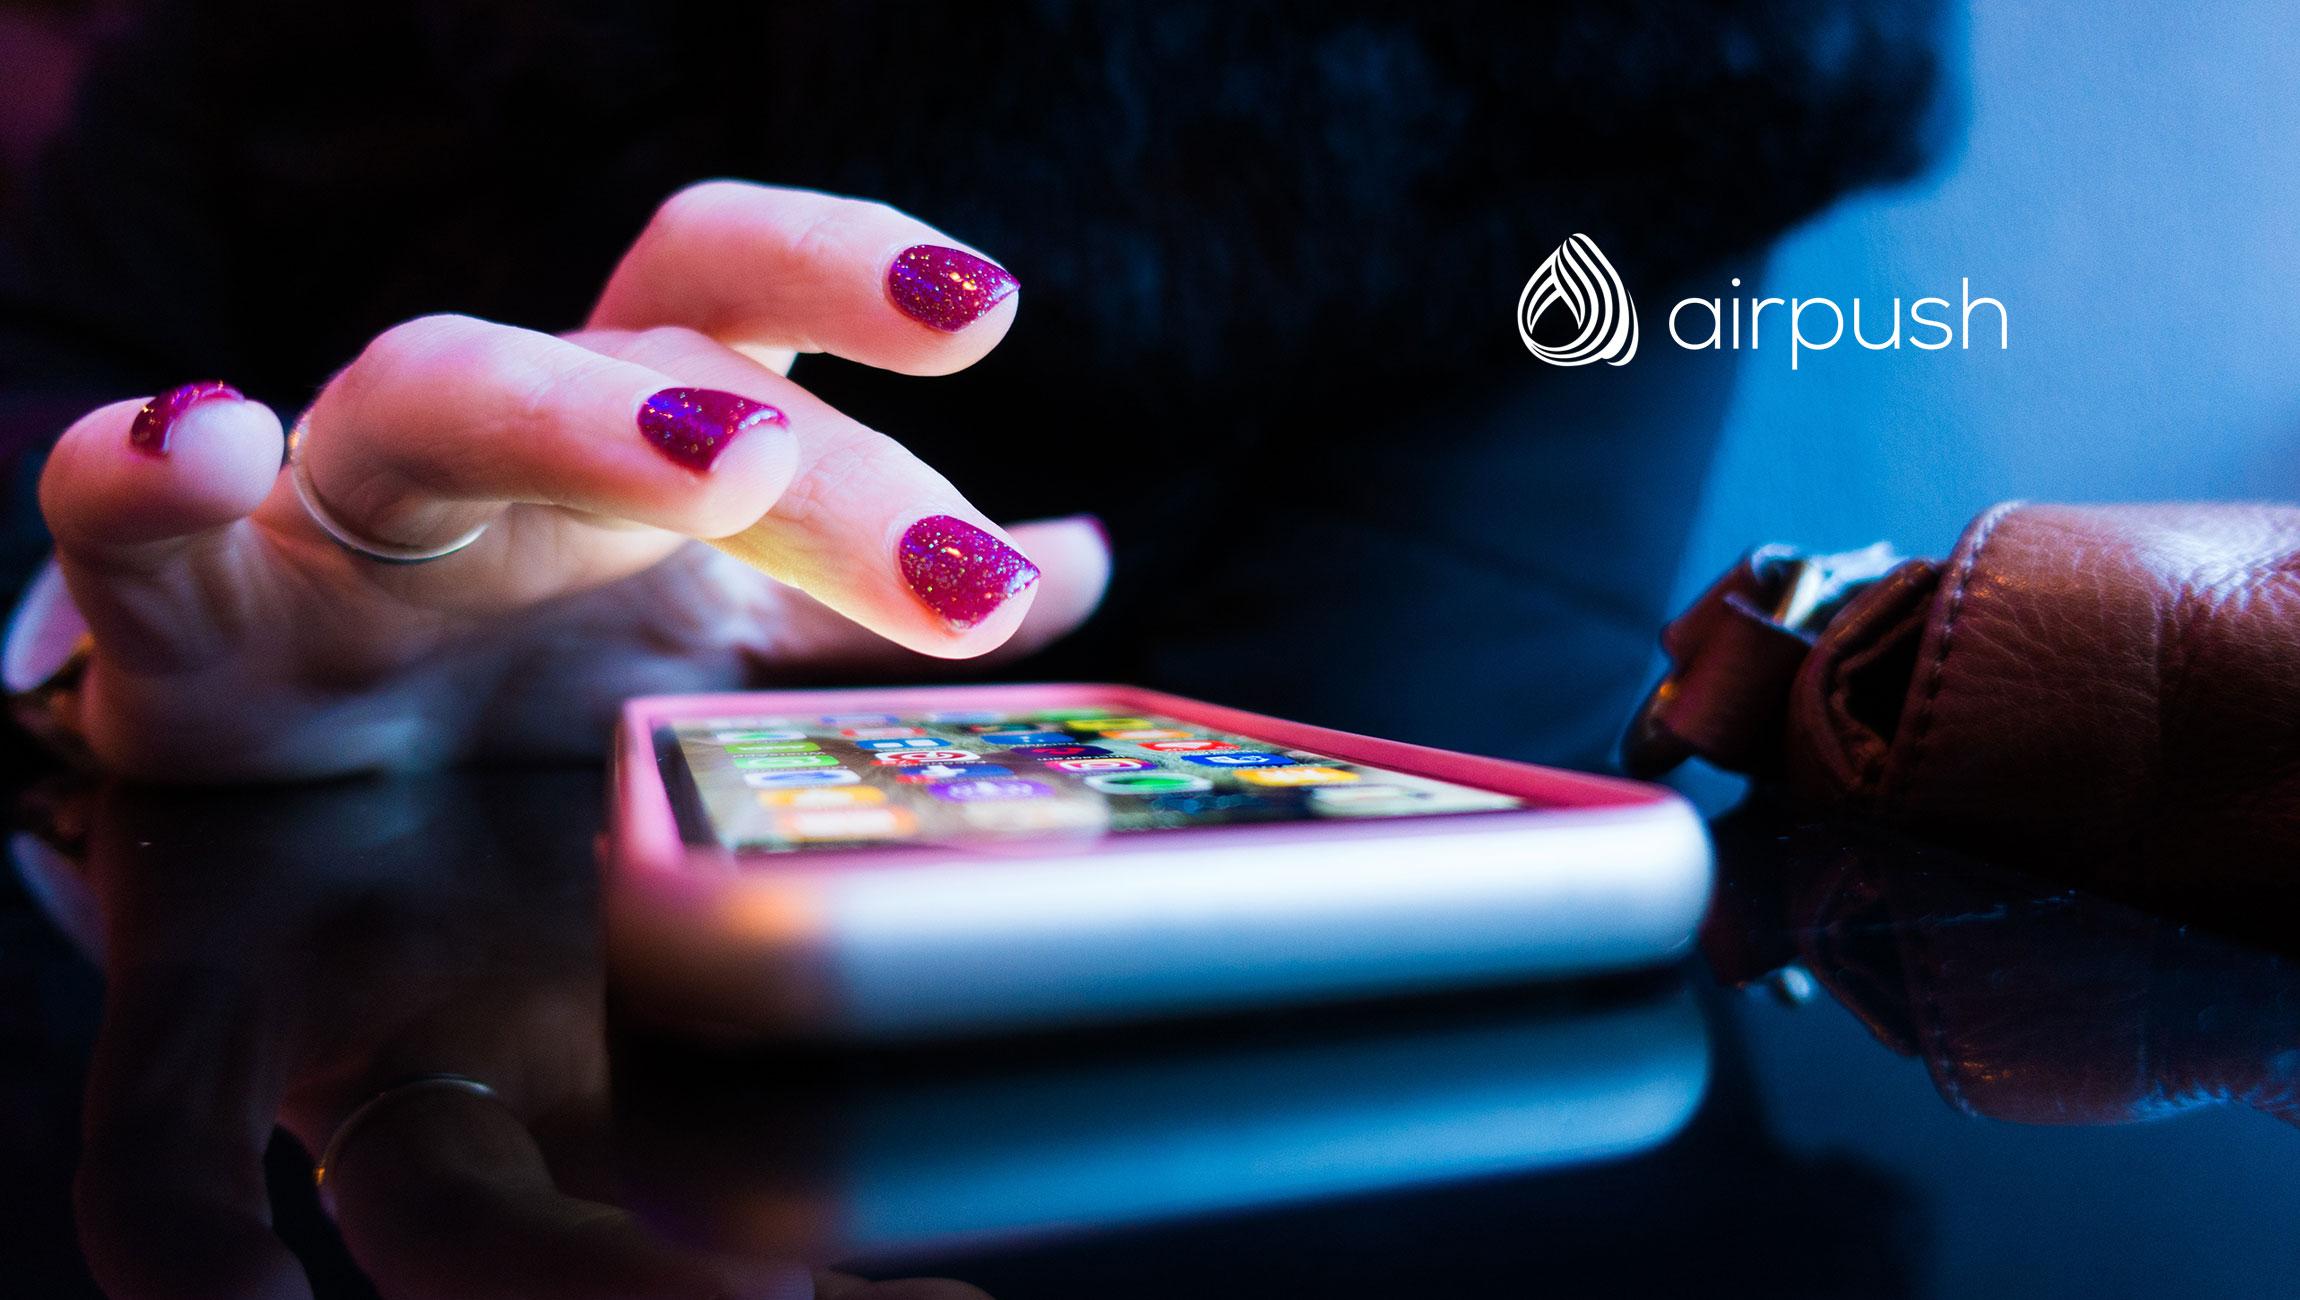 Airpush Announces Acquisition of General Mobile Corporation (GMobi)